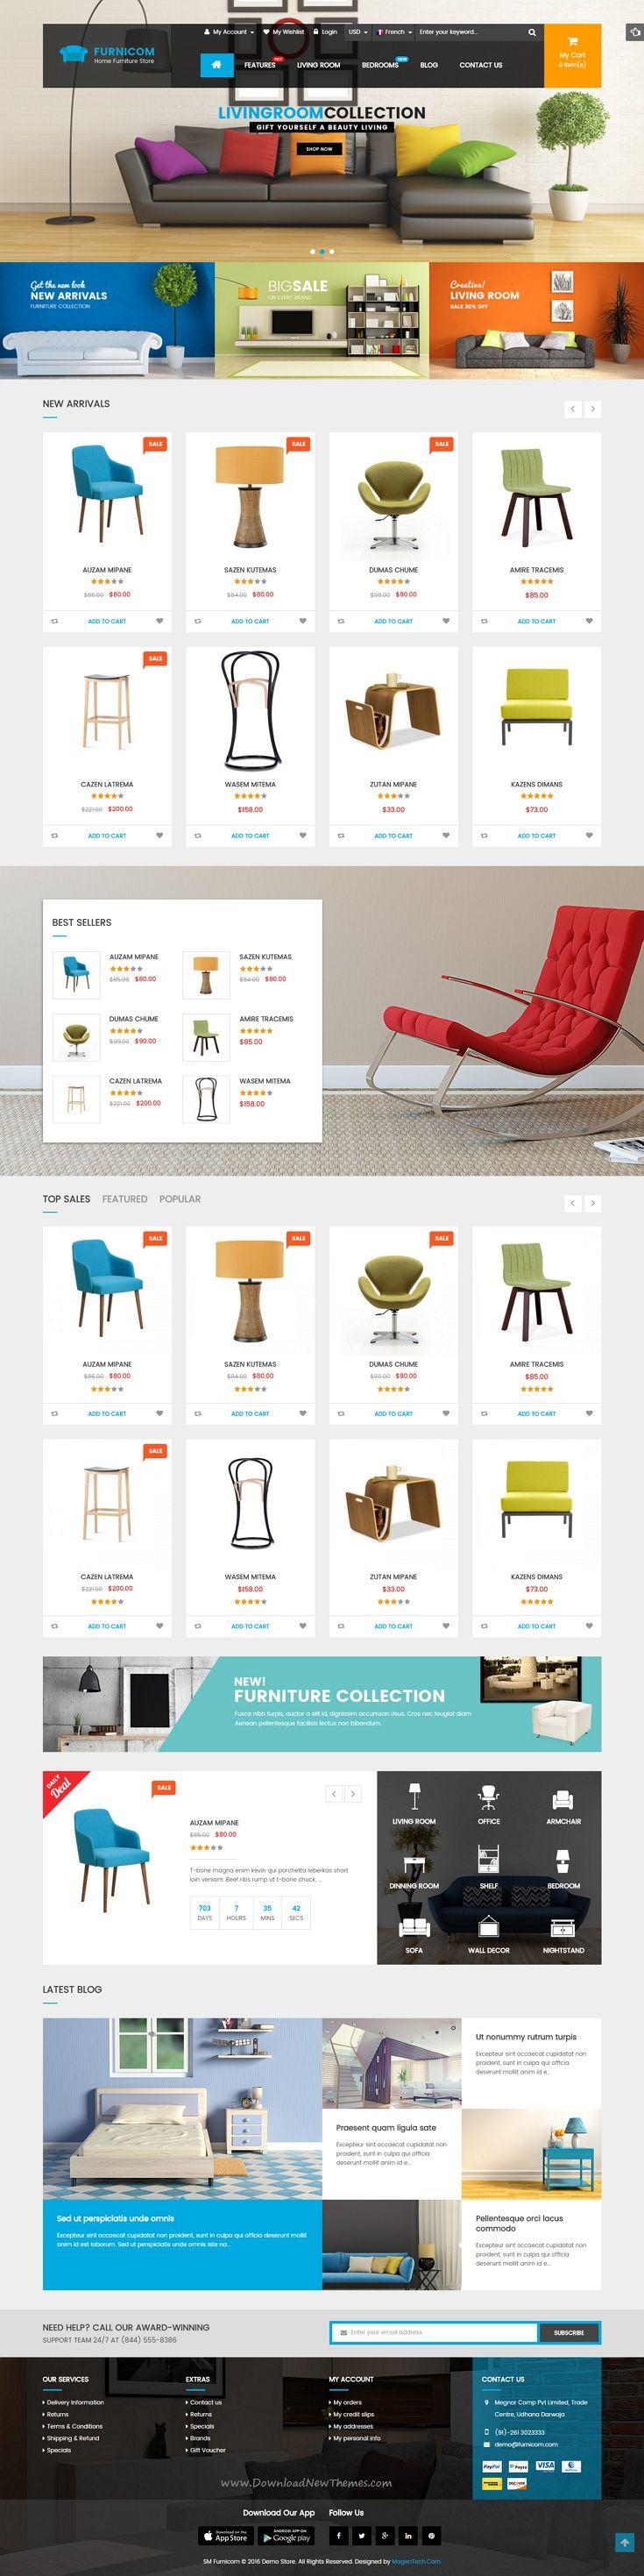 Furnicom   Responsive Magento 2 and 1 9 Furniture Theme. 25  beautiful Magento design ideas on Pinterest   Portfolio